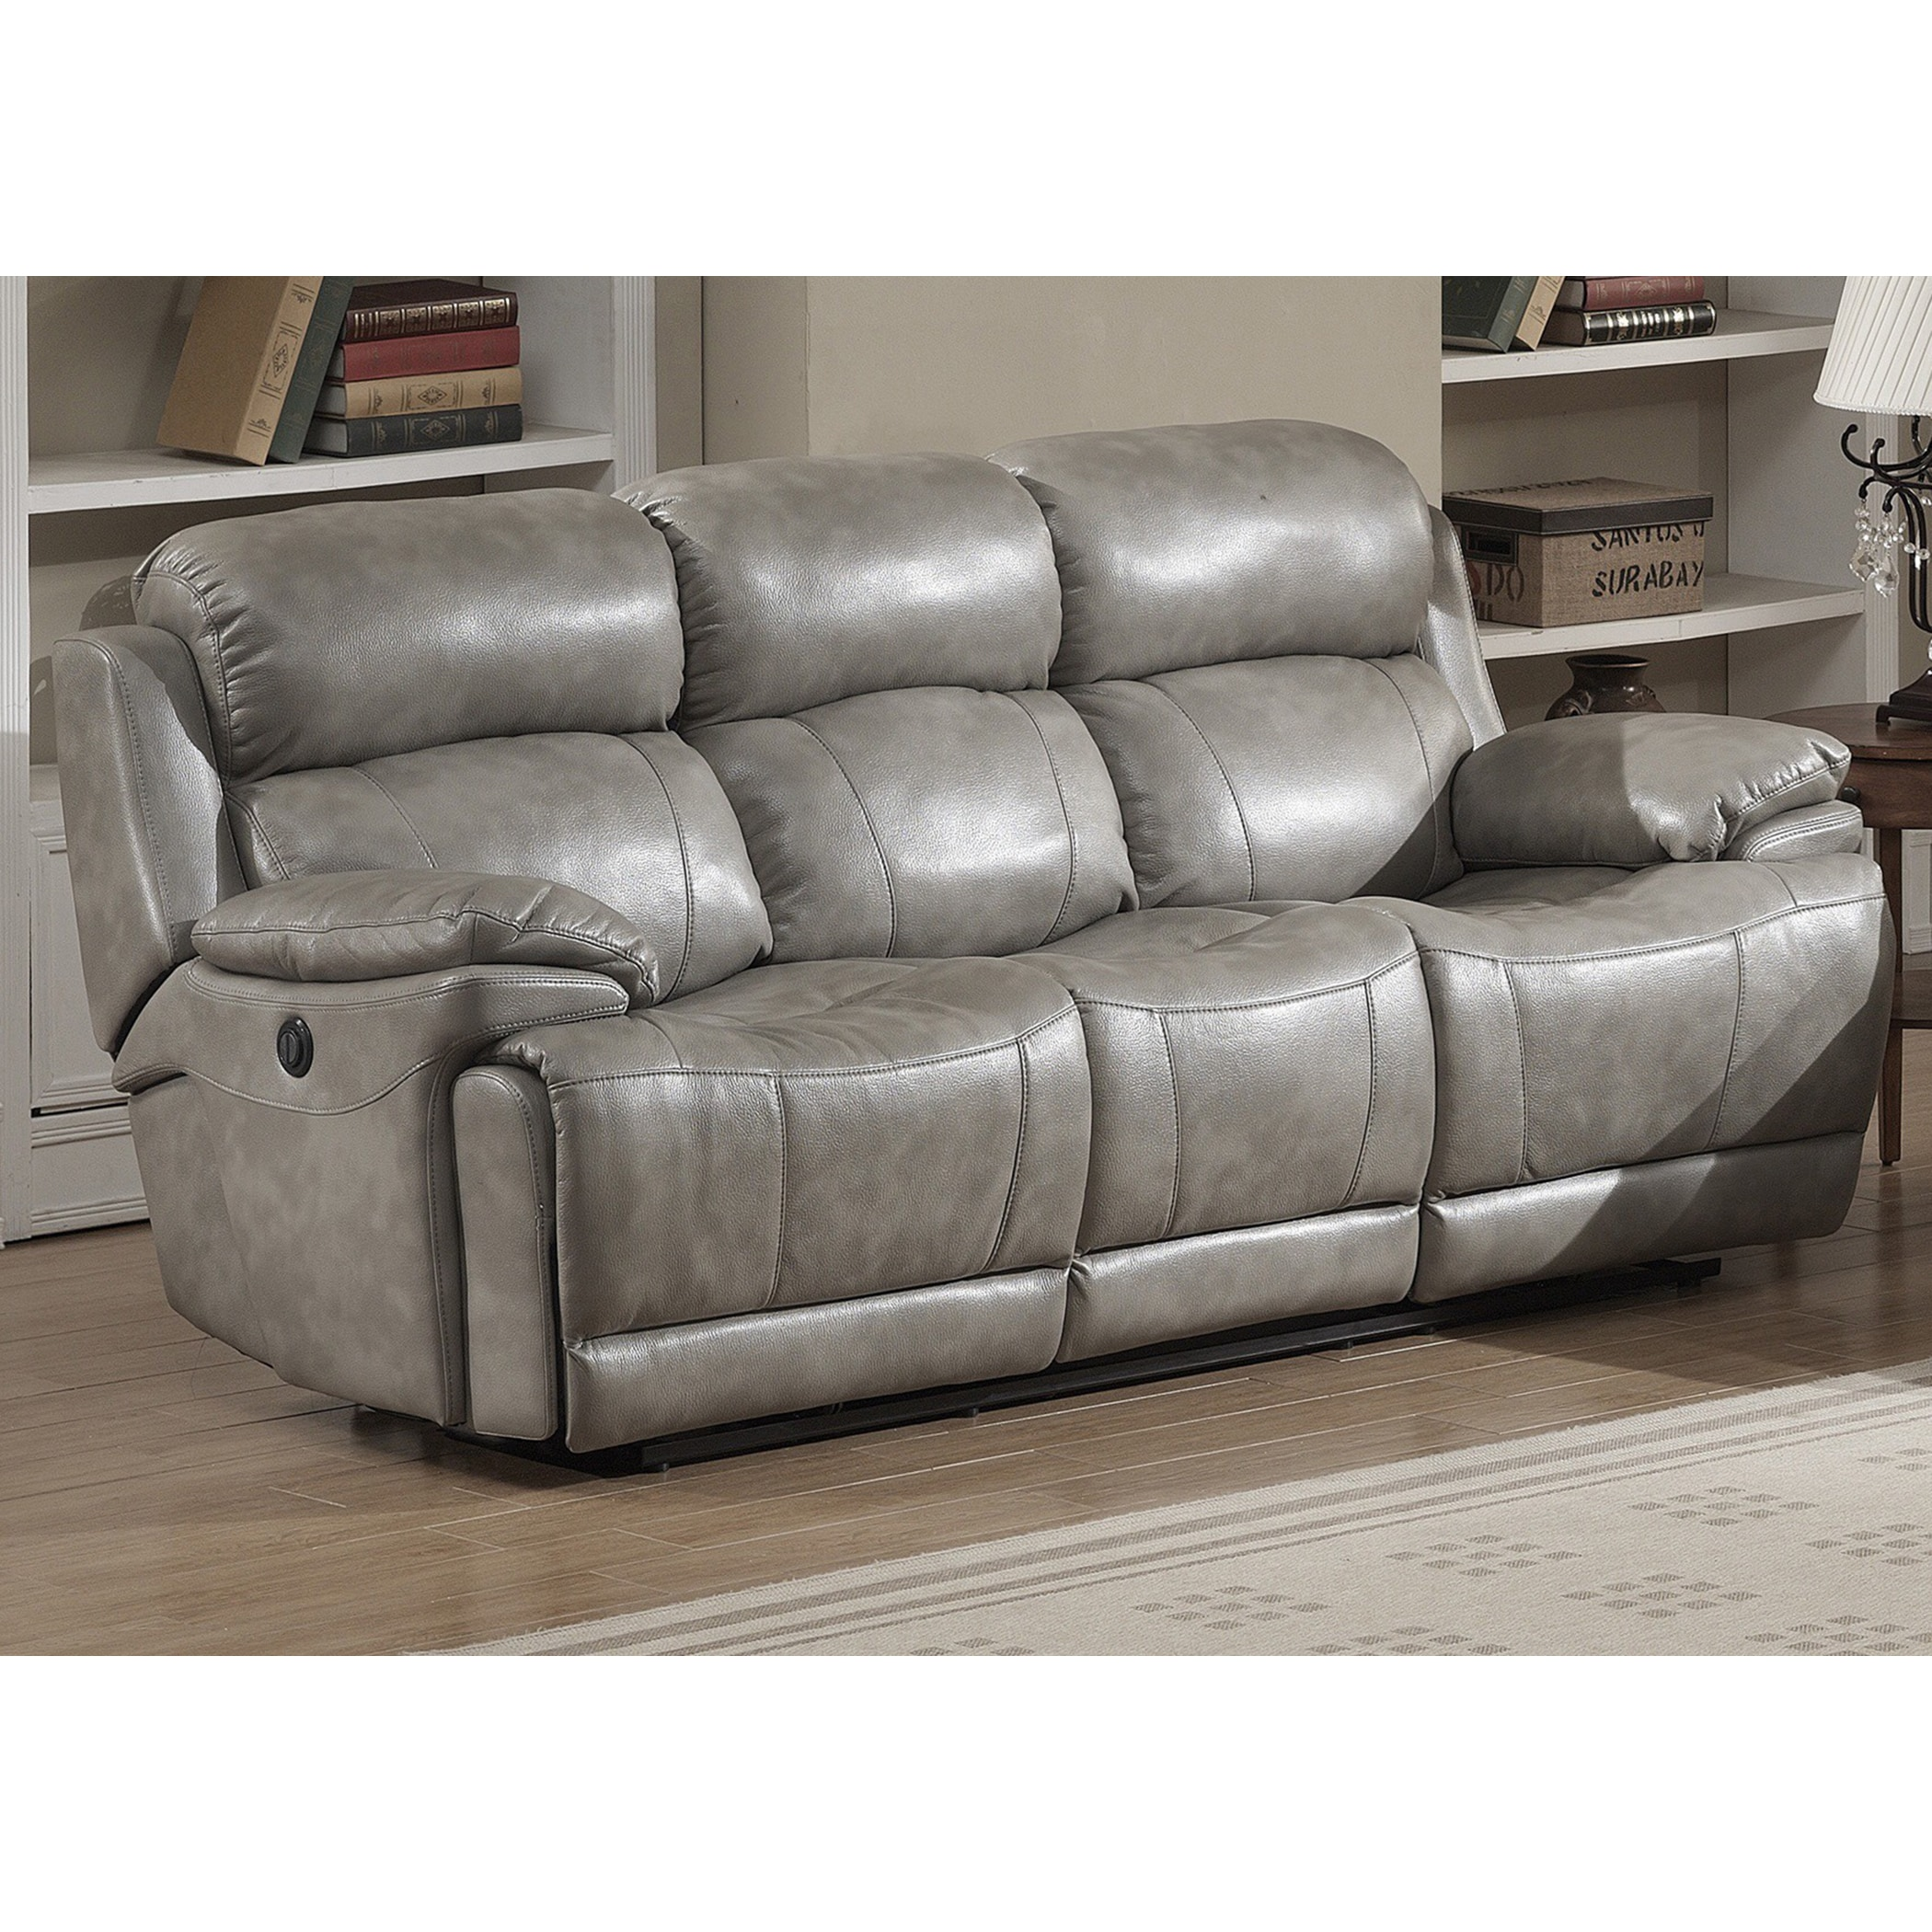 Estella Italian Power Contemporary Grey Reclining Sofa Leather dCxoeB